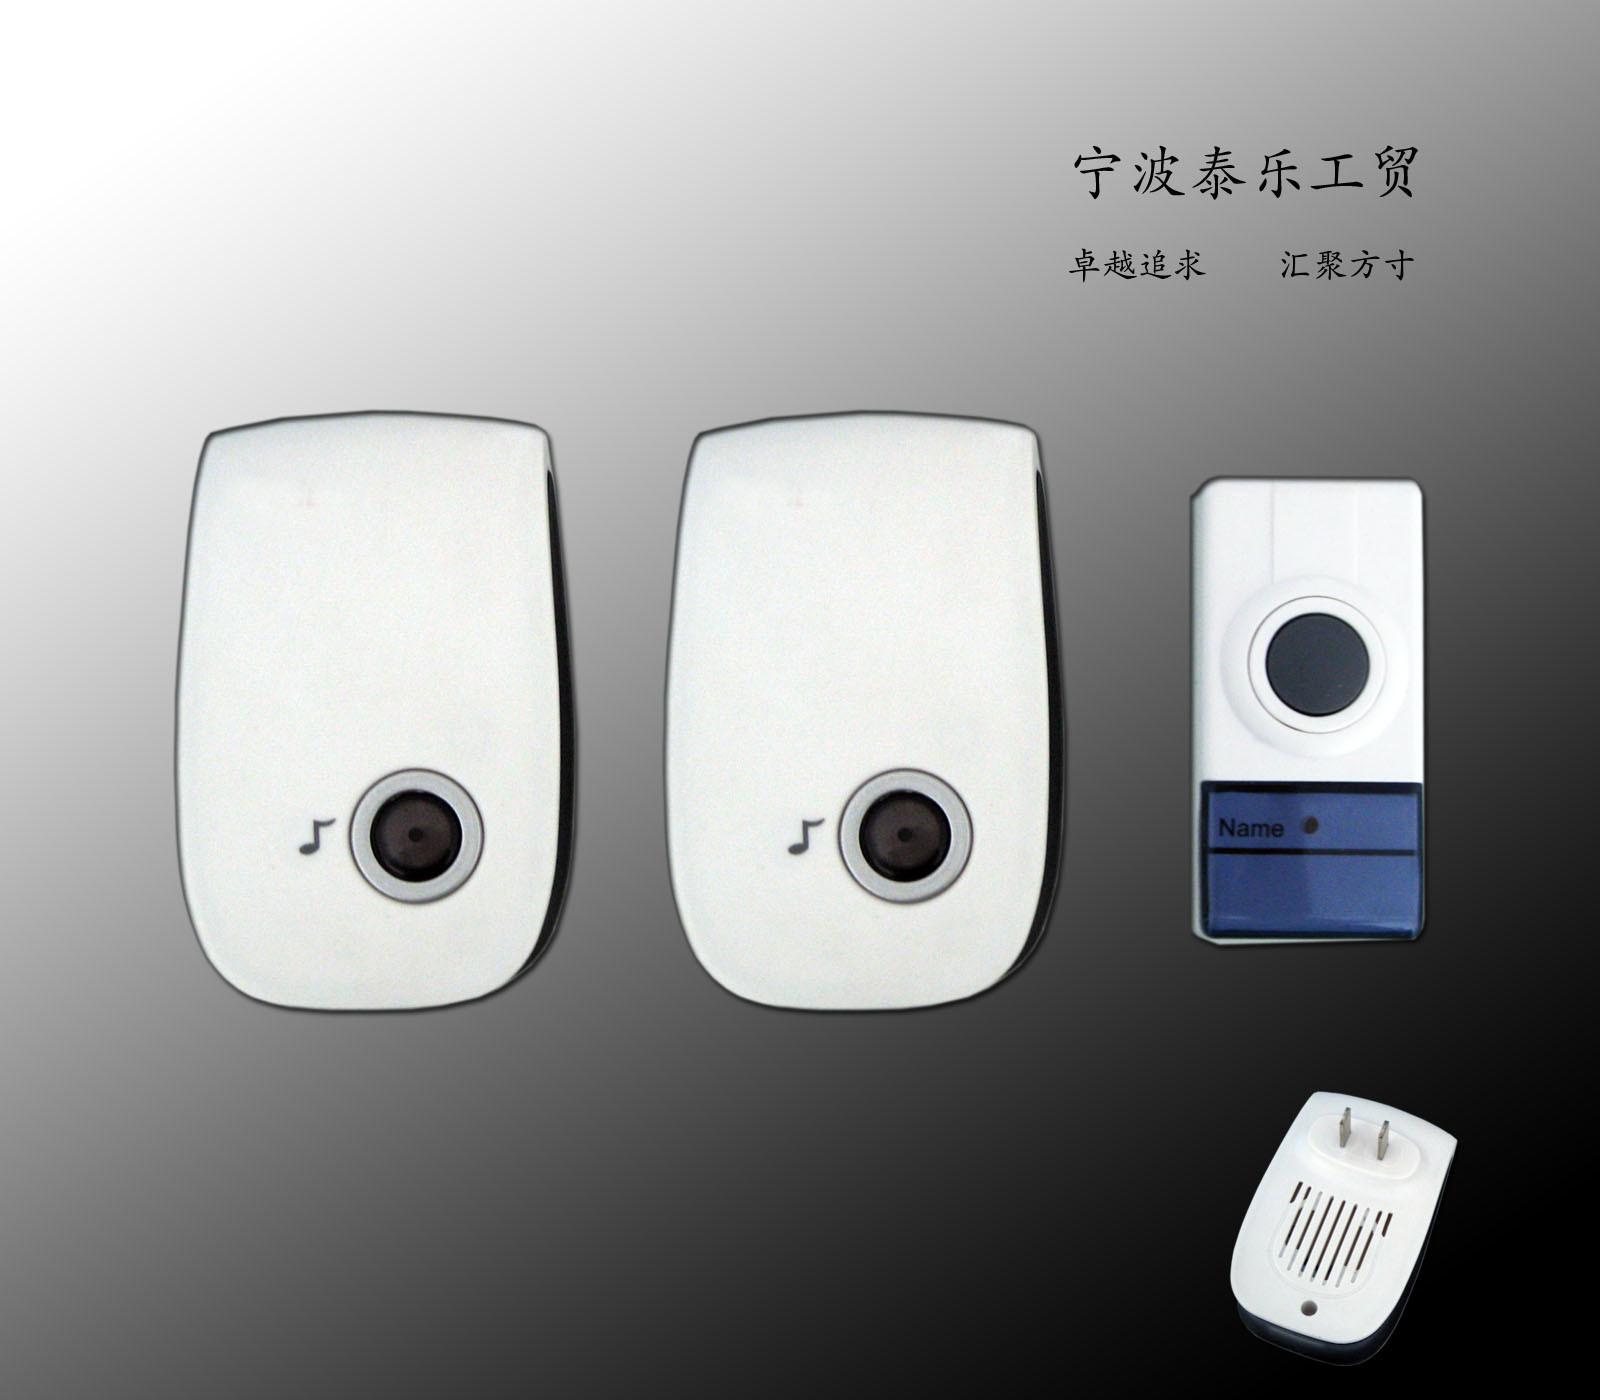 China Ac Wireless Doorbell Tl 305 2 China Ac Doorbell